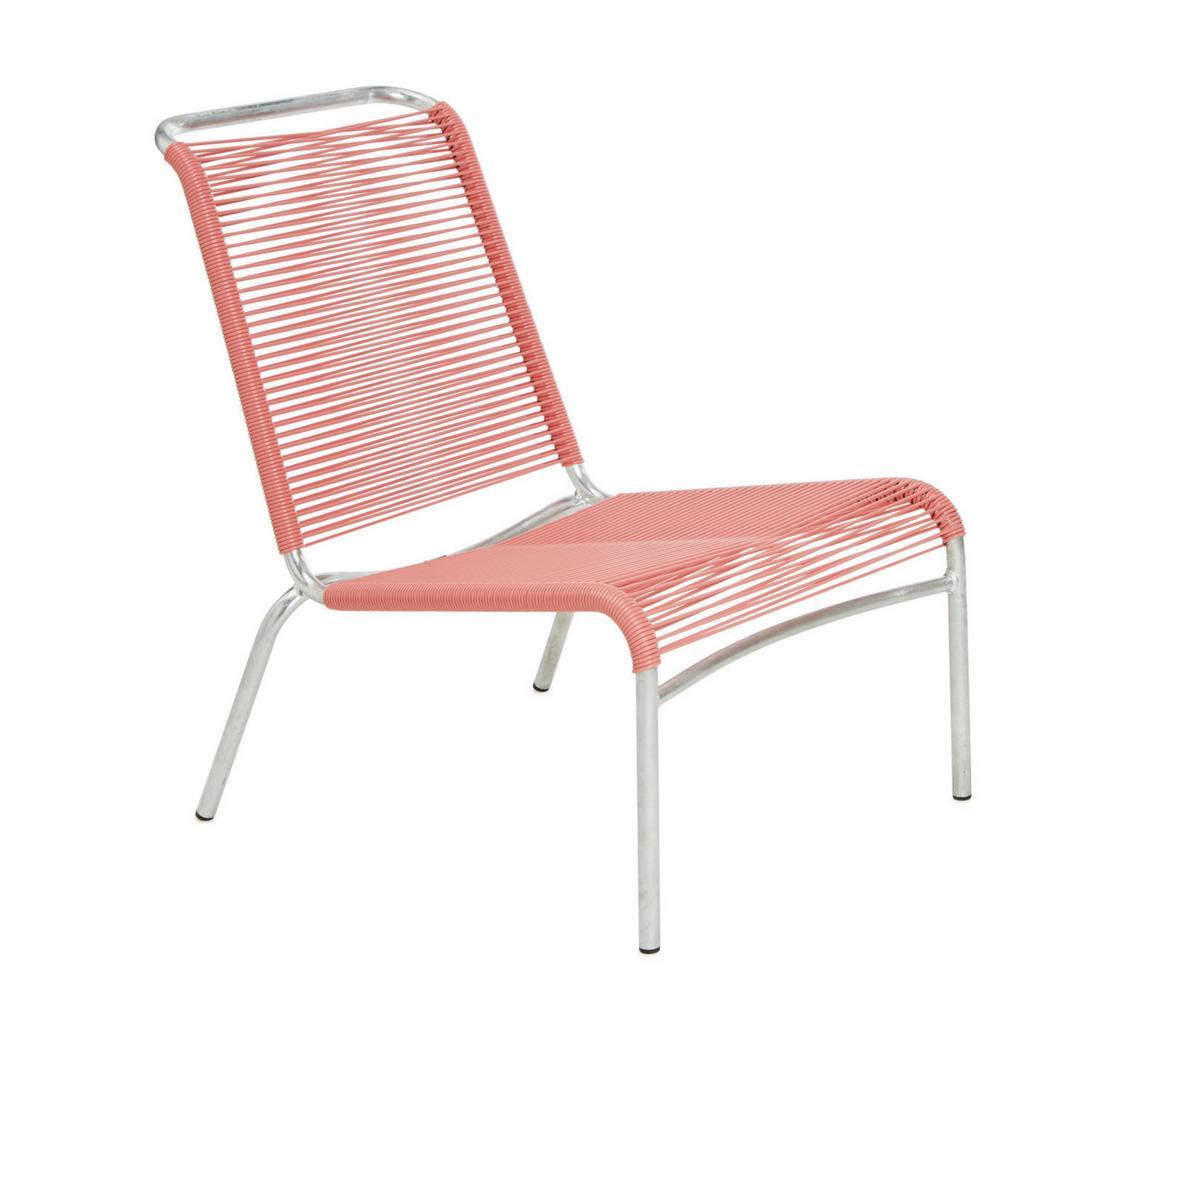 Altorfer Lounge Stuhl 1139 Altrosa von Embru